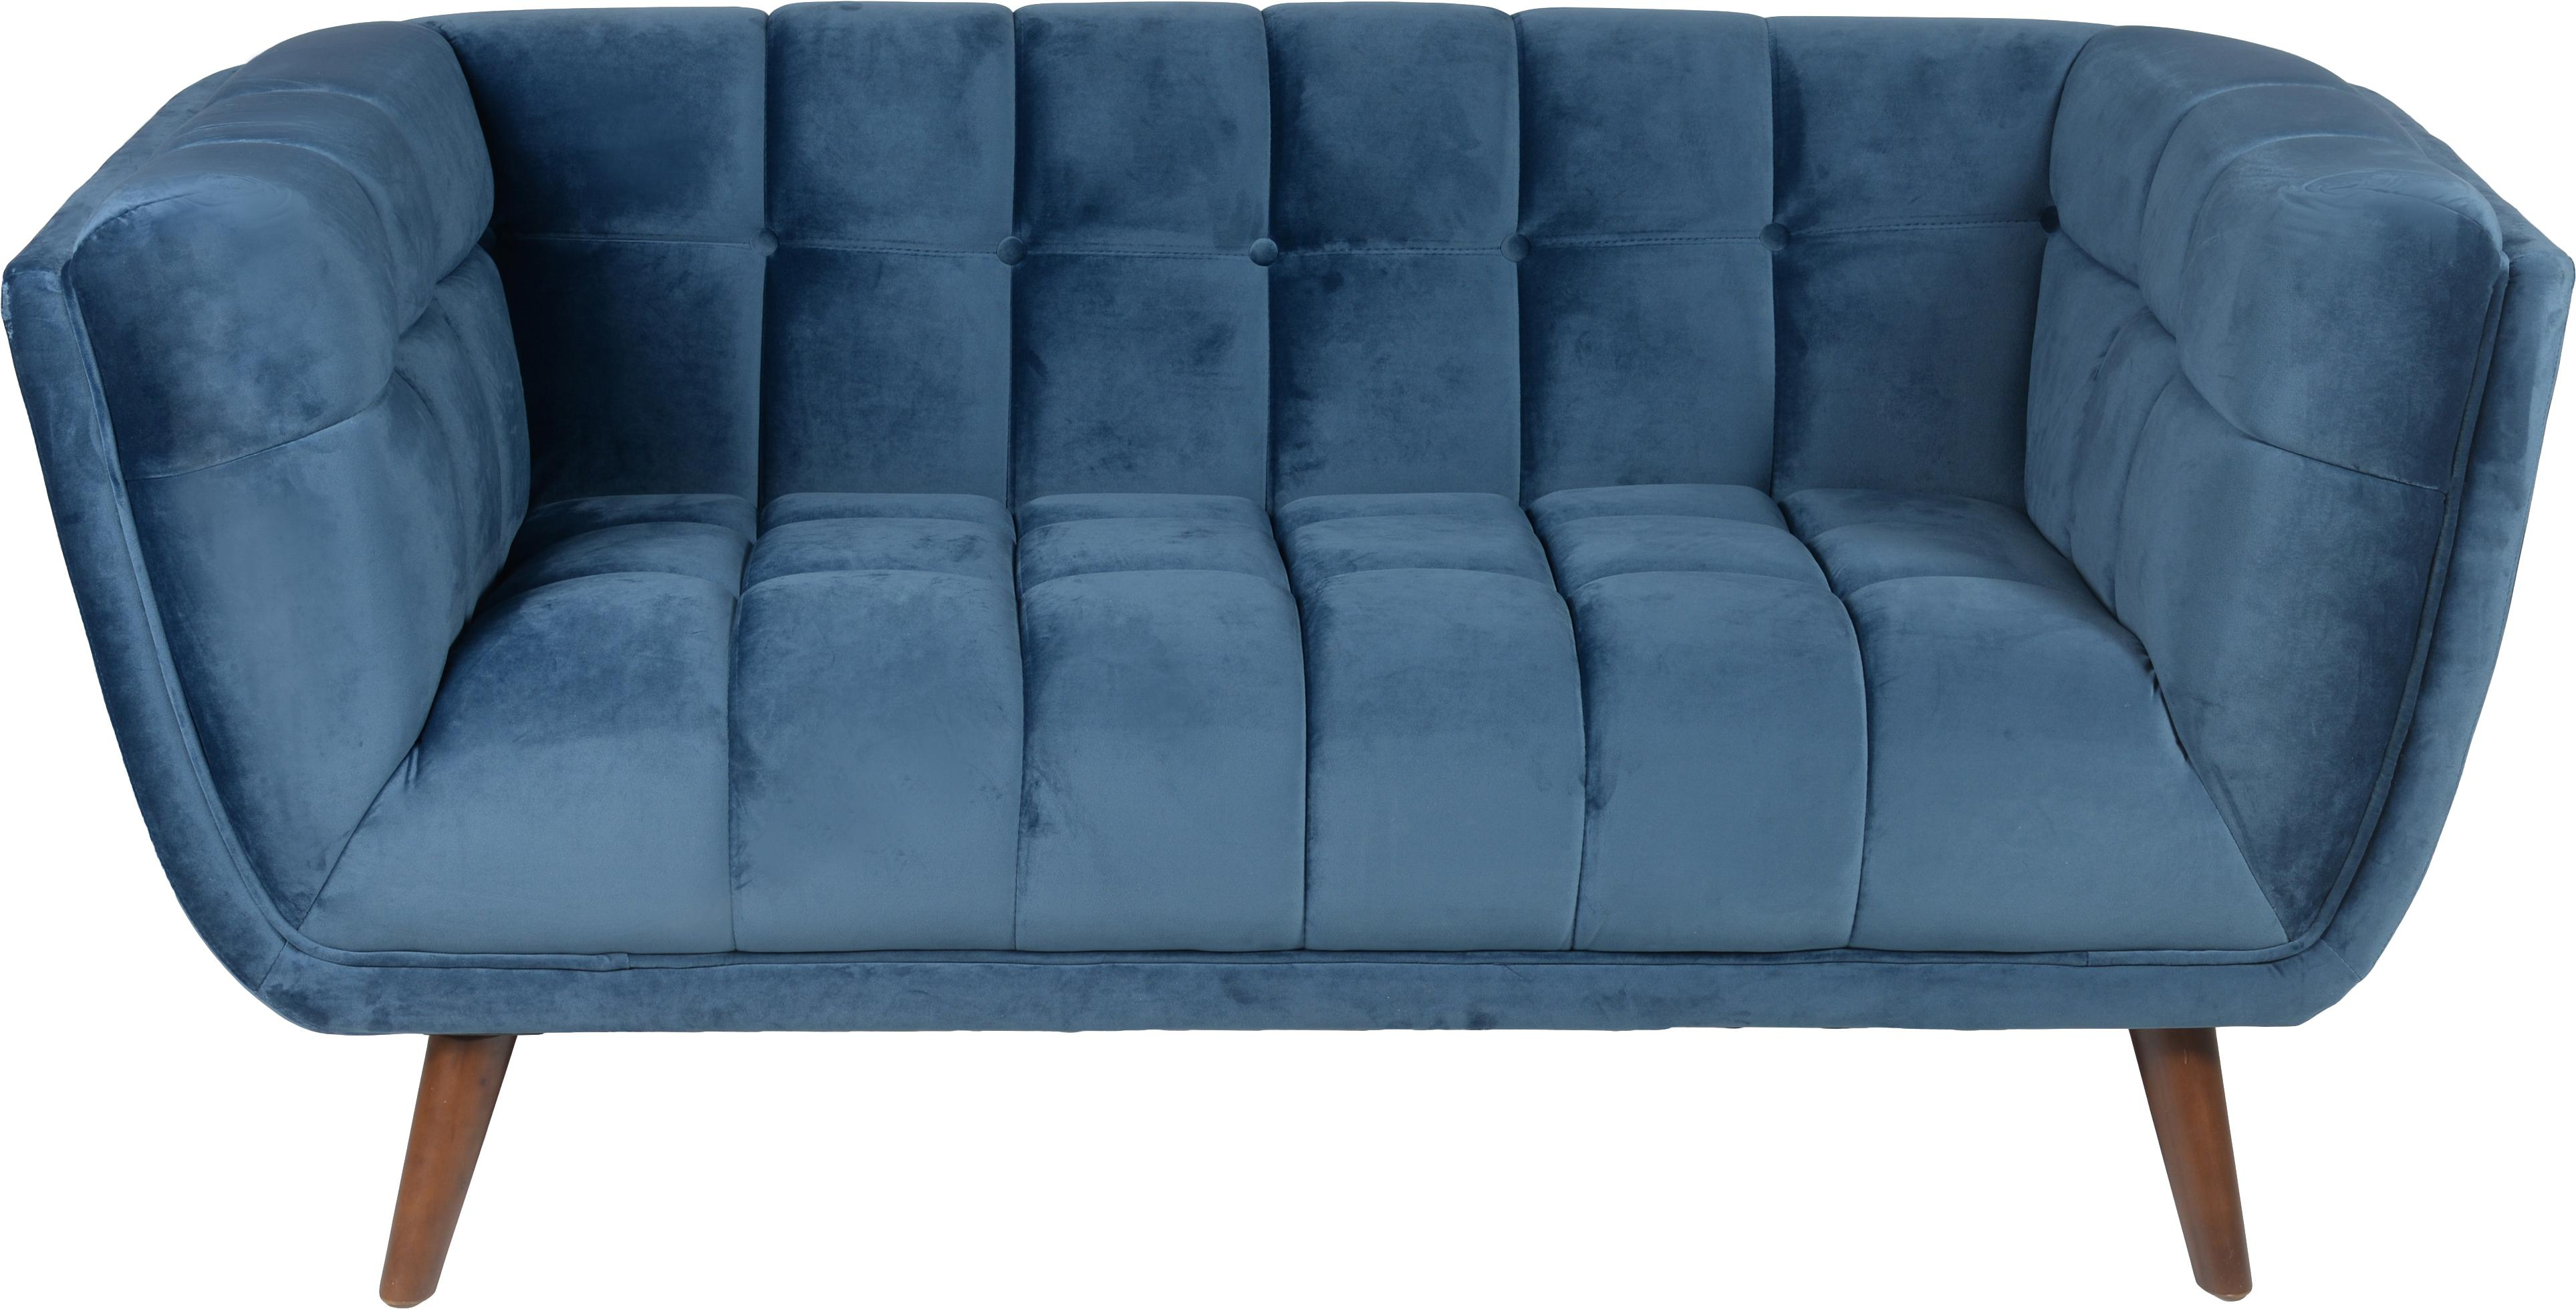 Fluwelen bank Beryl (2-zits), Bekleding: polyesterfluweel, Poten: gelakt walnoothout, Frame: multiplex, Bekleding: polyurethaanschuim (25-30, Blauw, walnootkleurig, B 164 x D 90 cm